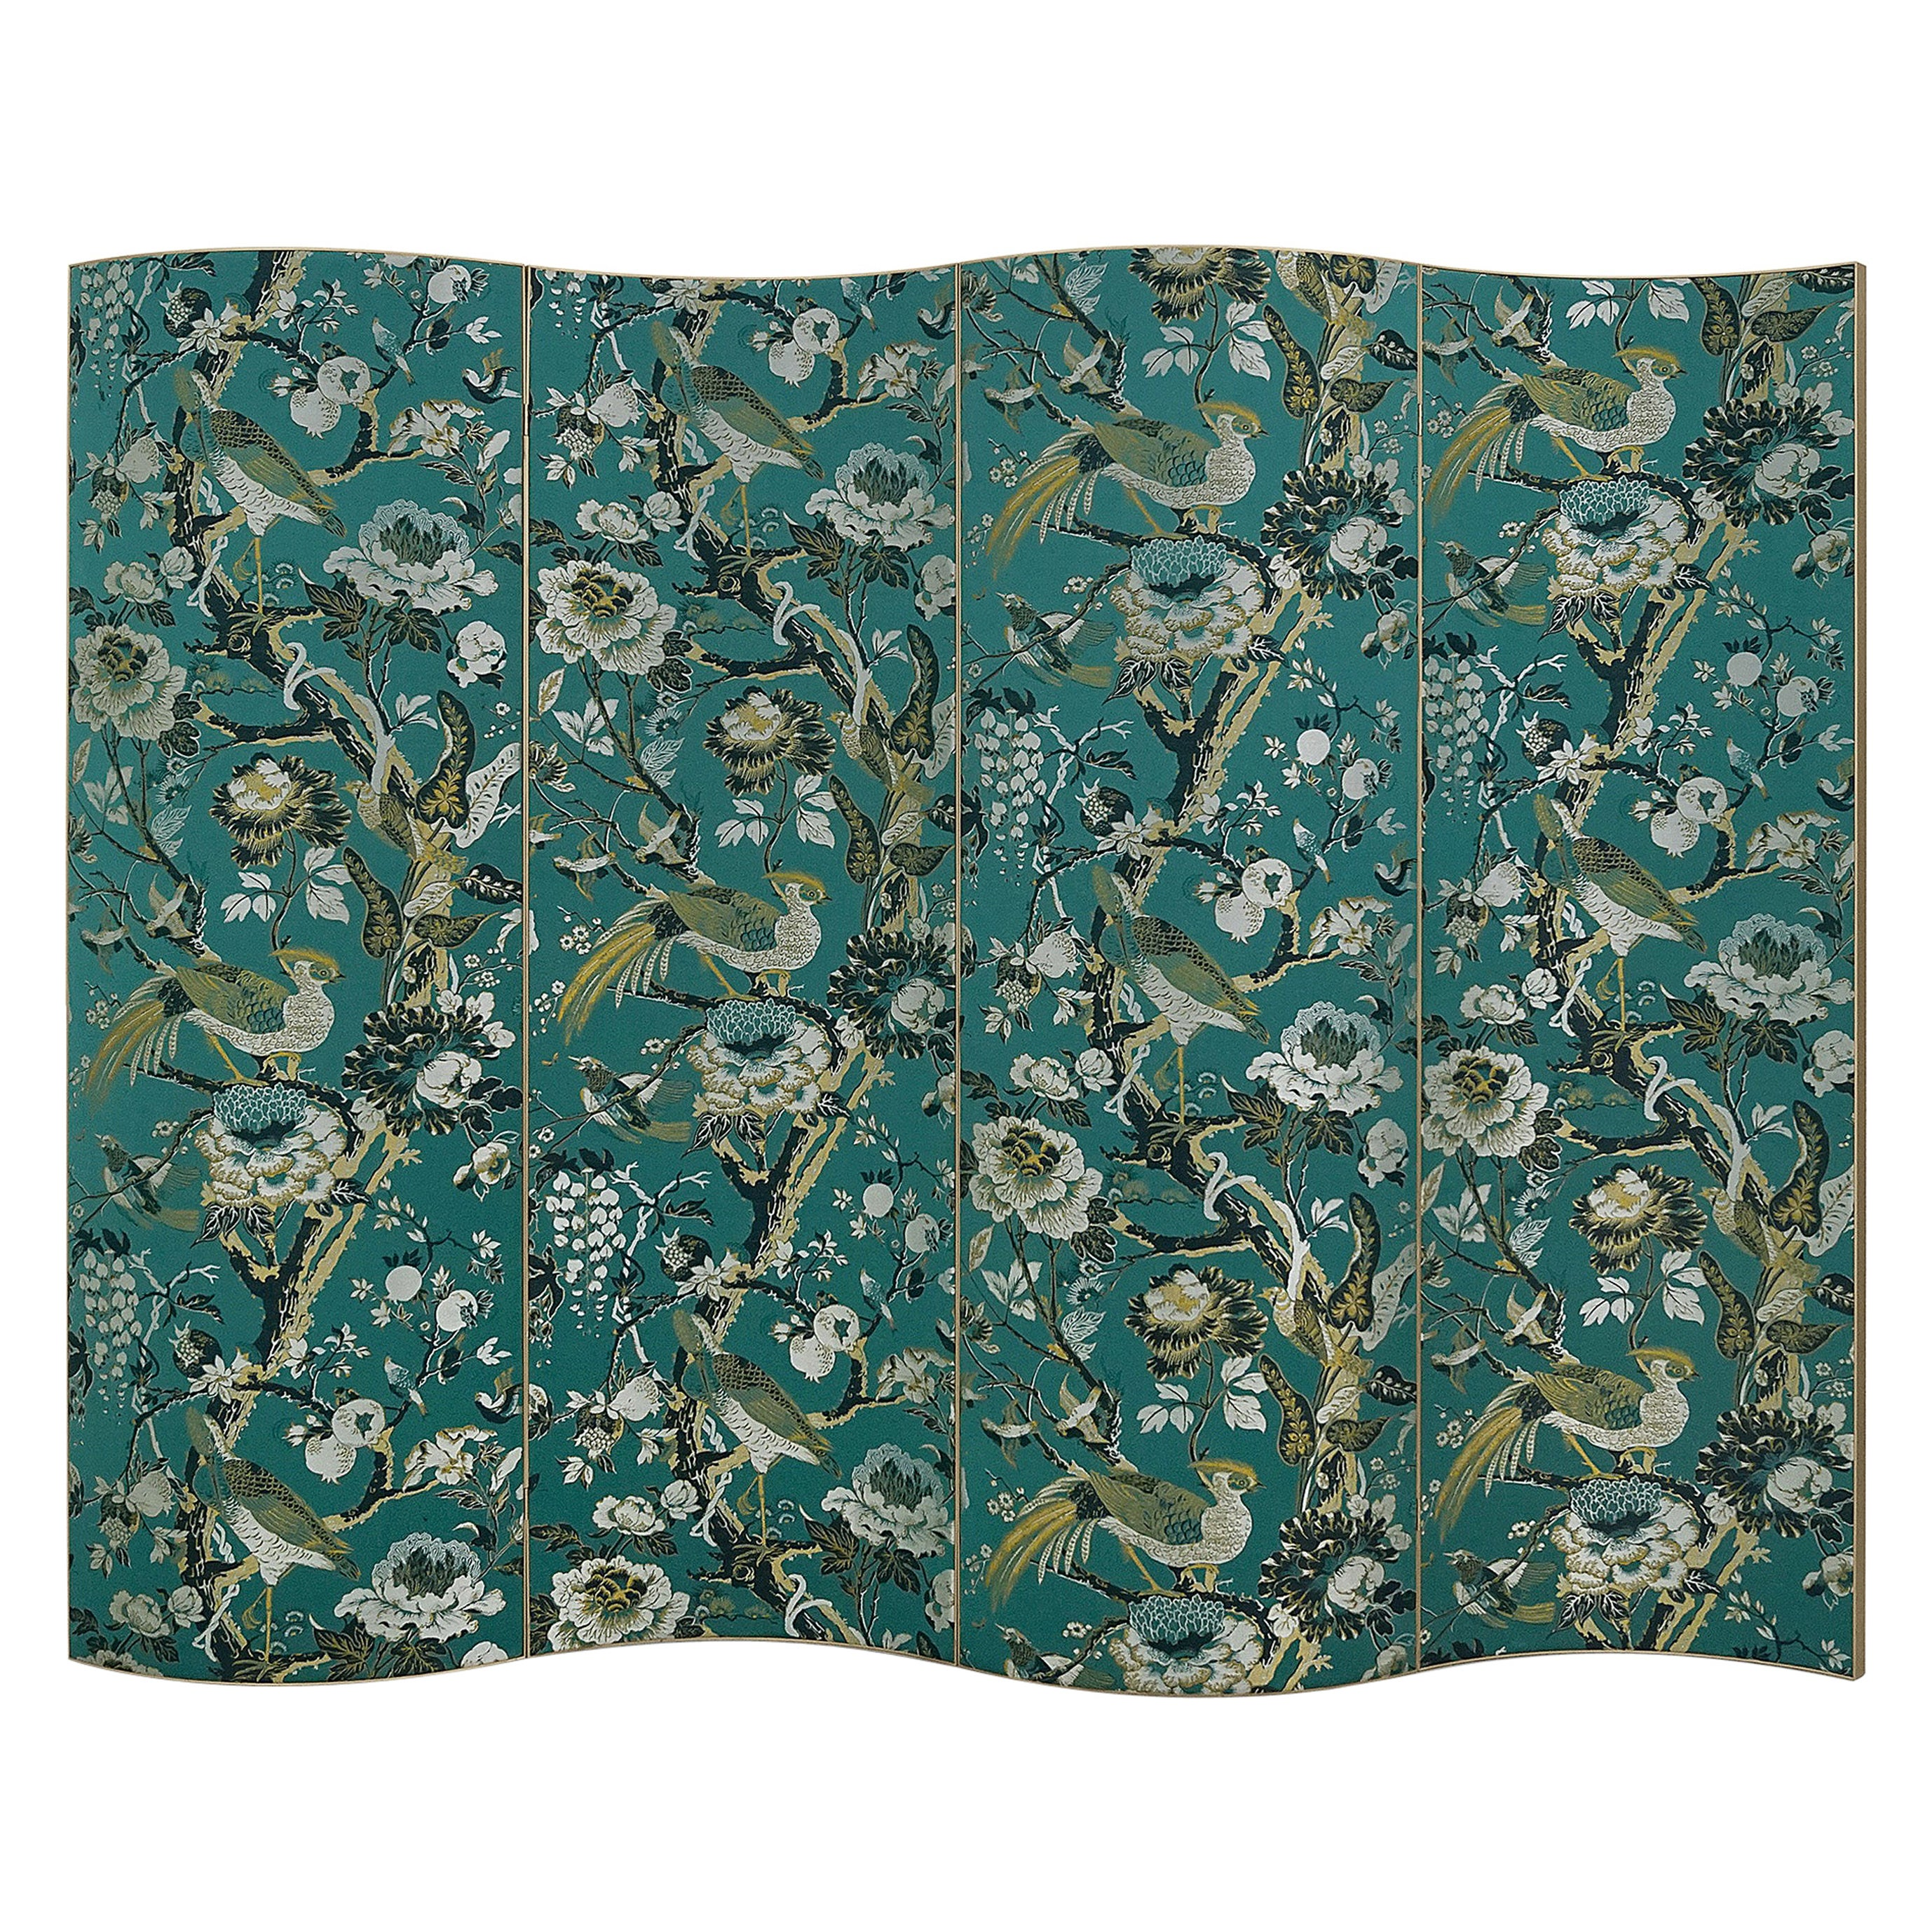 Folding Screen 'Kimono' Room Divider